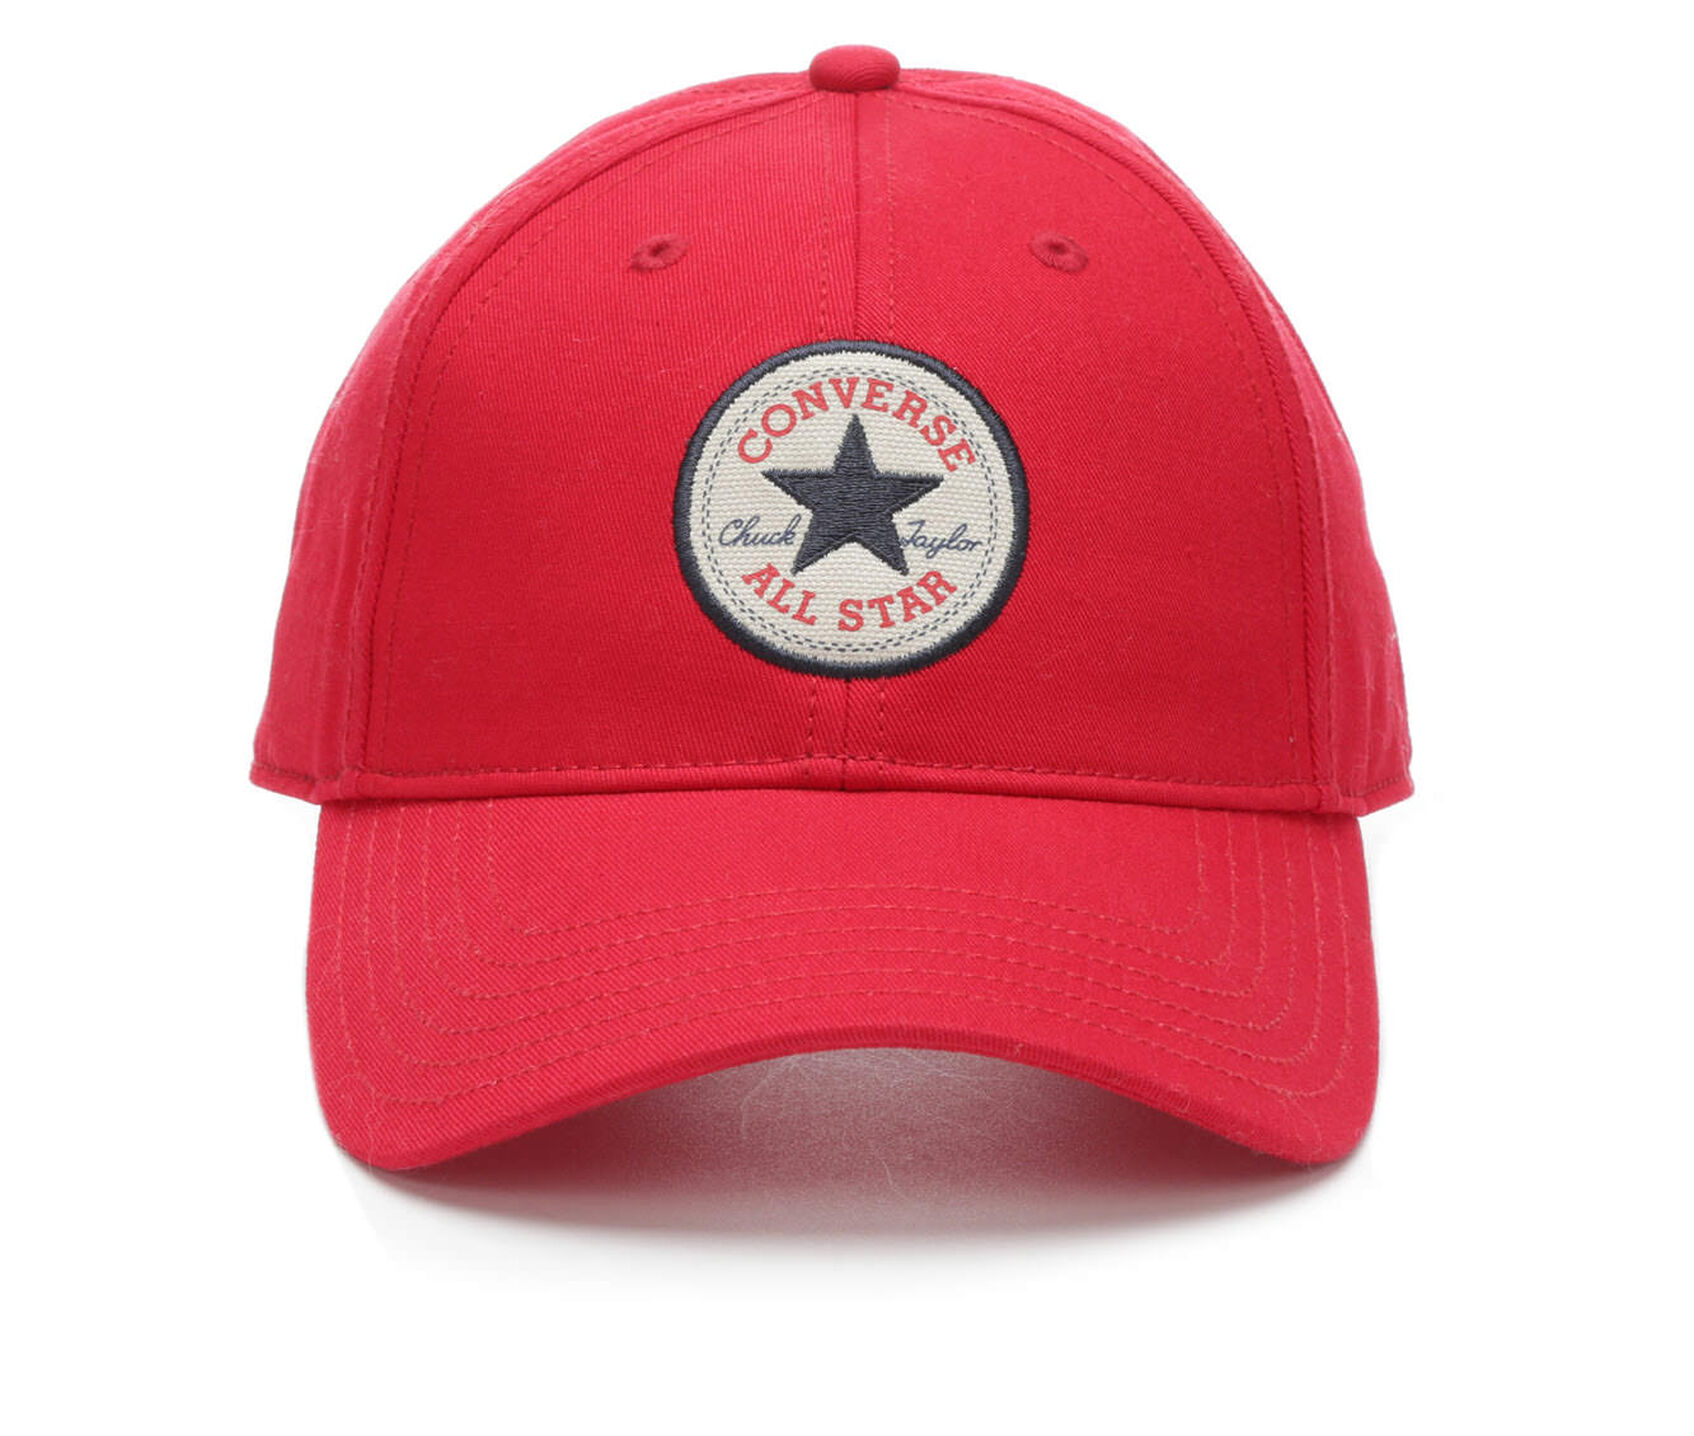 0c67d0053e3 Converse Core Classic Twill Baseball Cap | Shoe Carnival